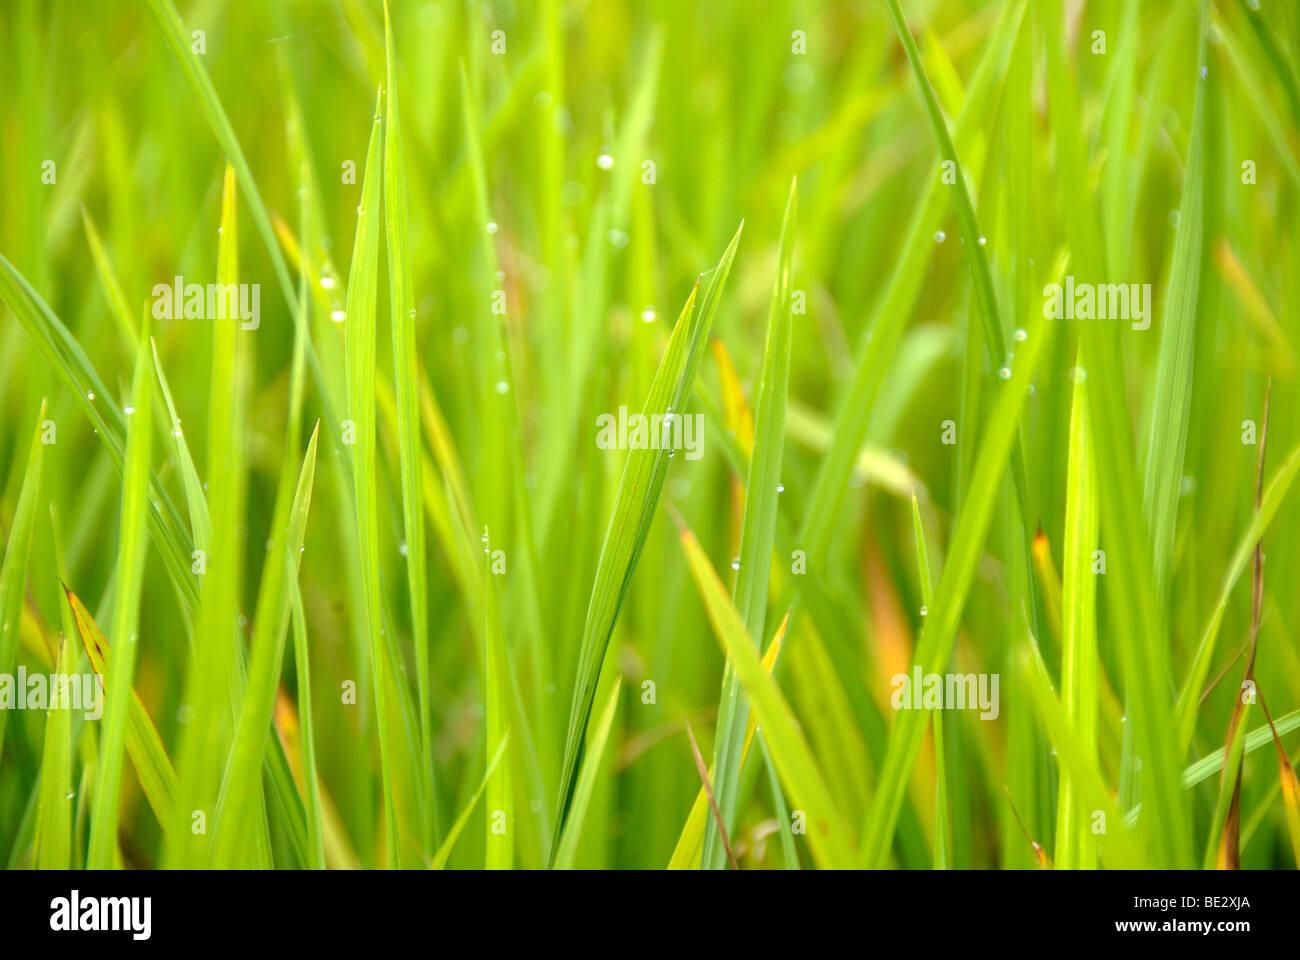 Rice, rice blades, stalks, Yuanyang, in Xinji, Yunnan Province, People's Republic of China, Asia - Stock Image